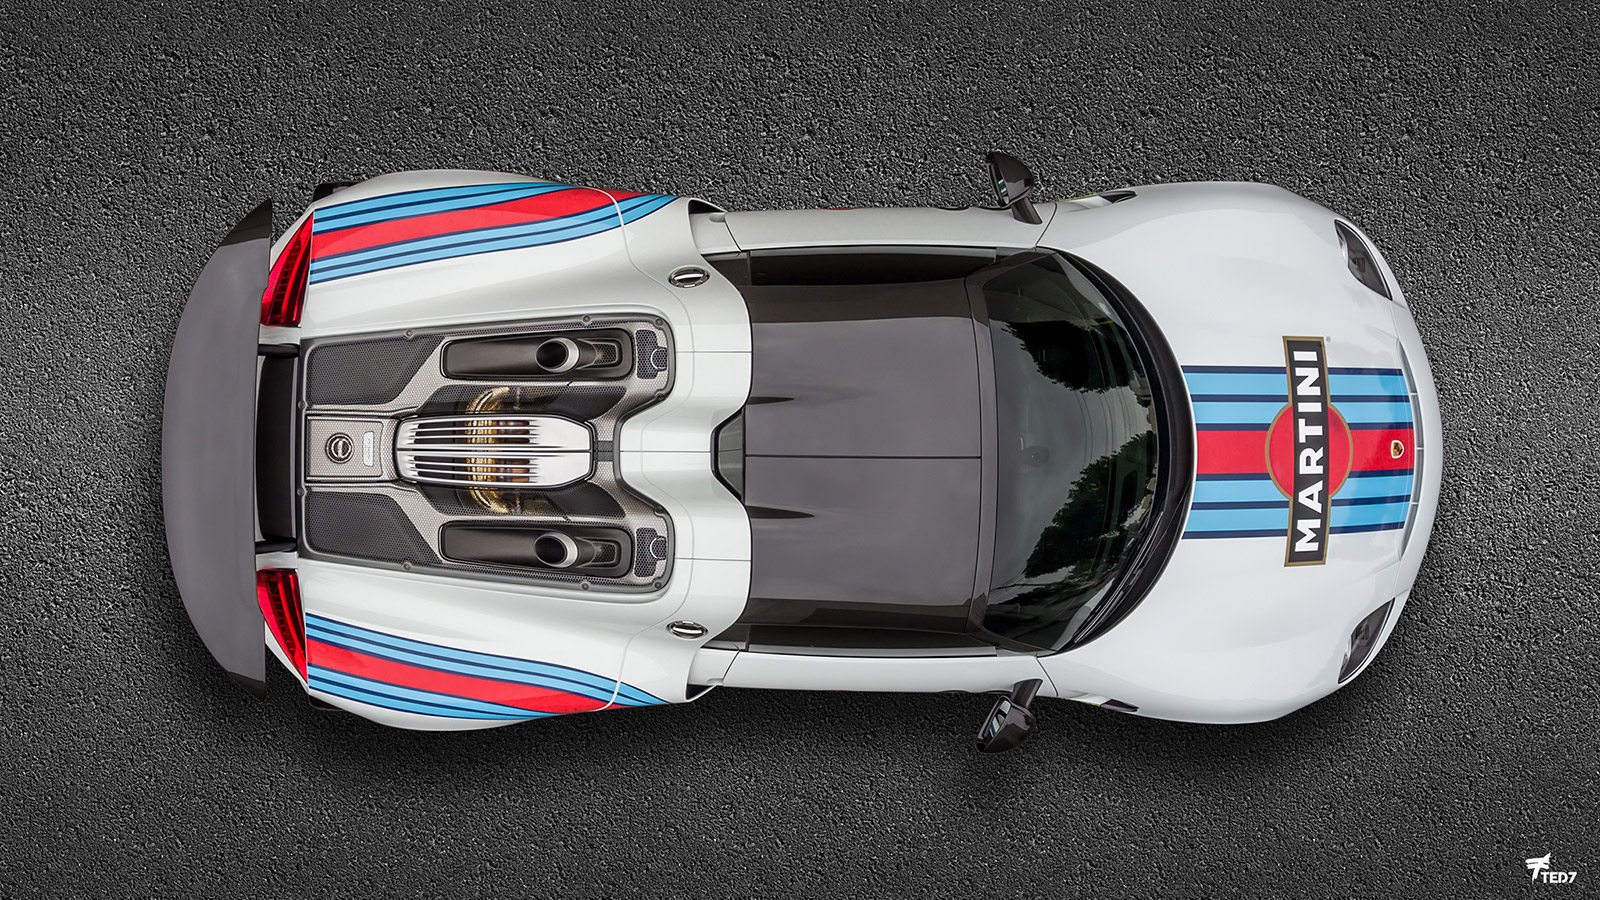 Porsche 918 Spyder Martini - Protective Film Solutions